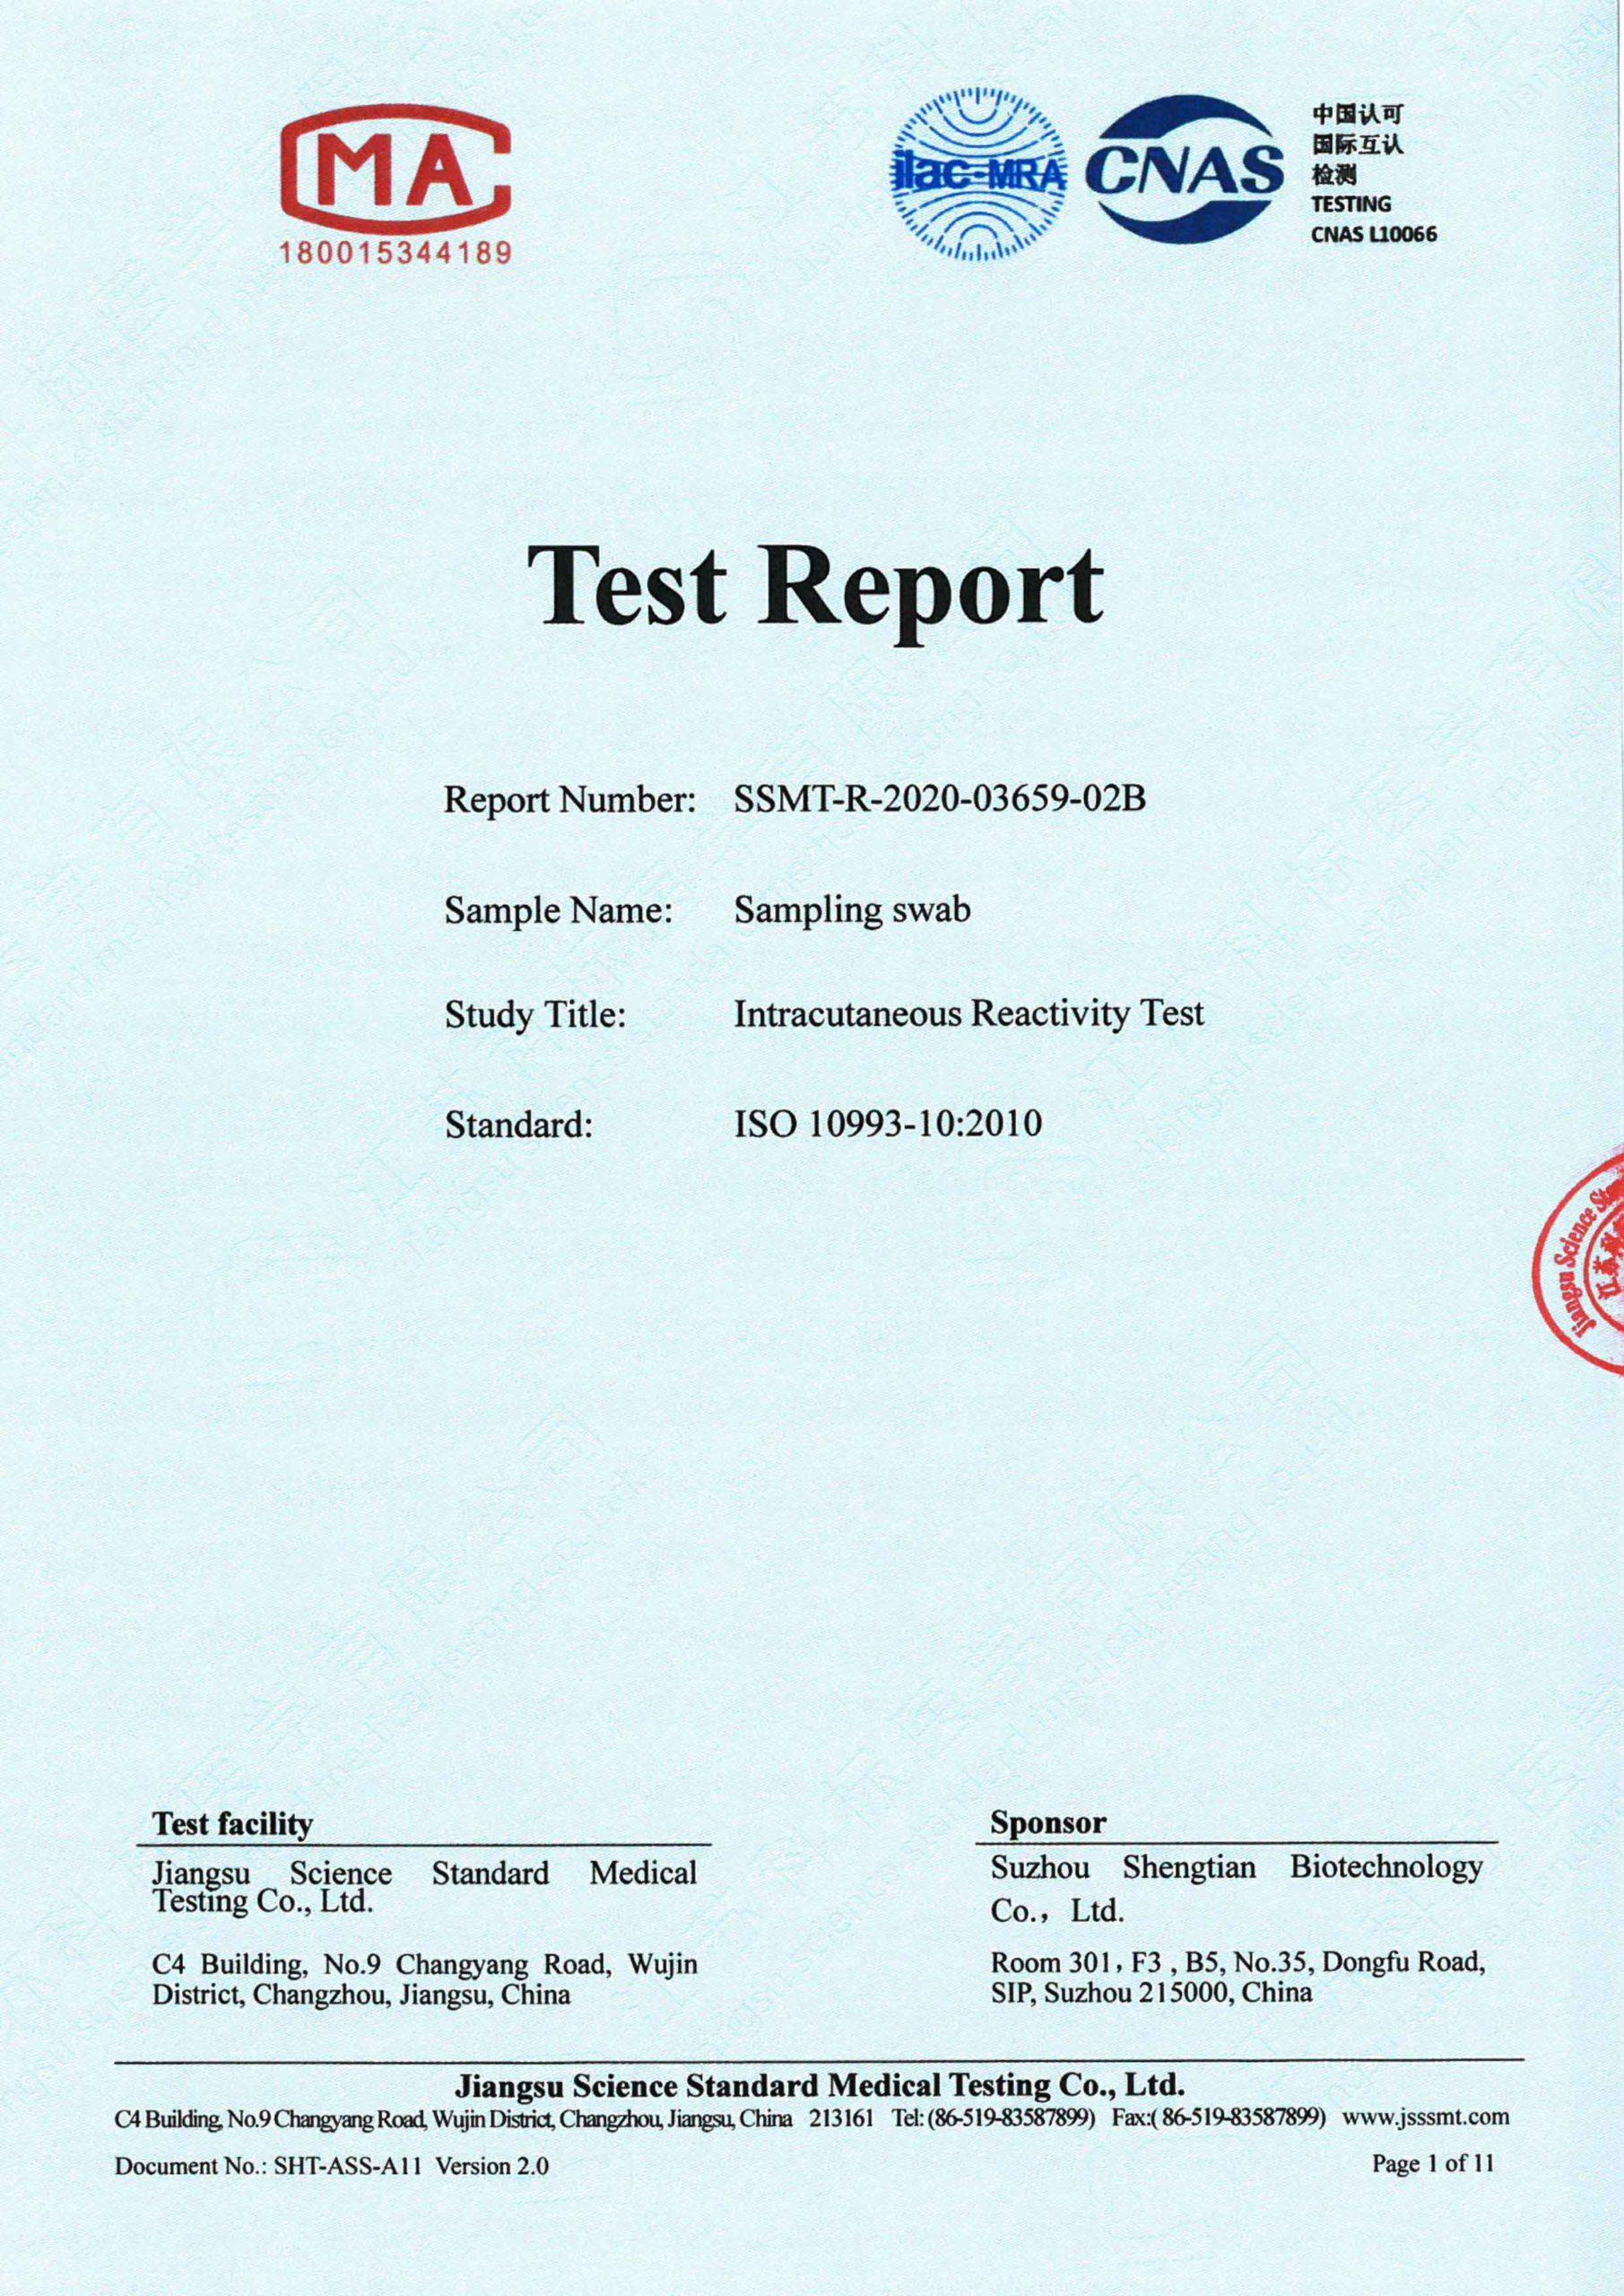 Intracutaneous Reactivity Test Certificate